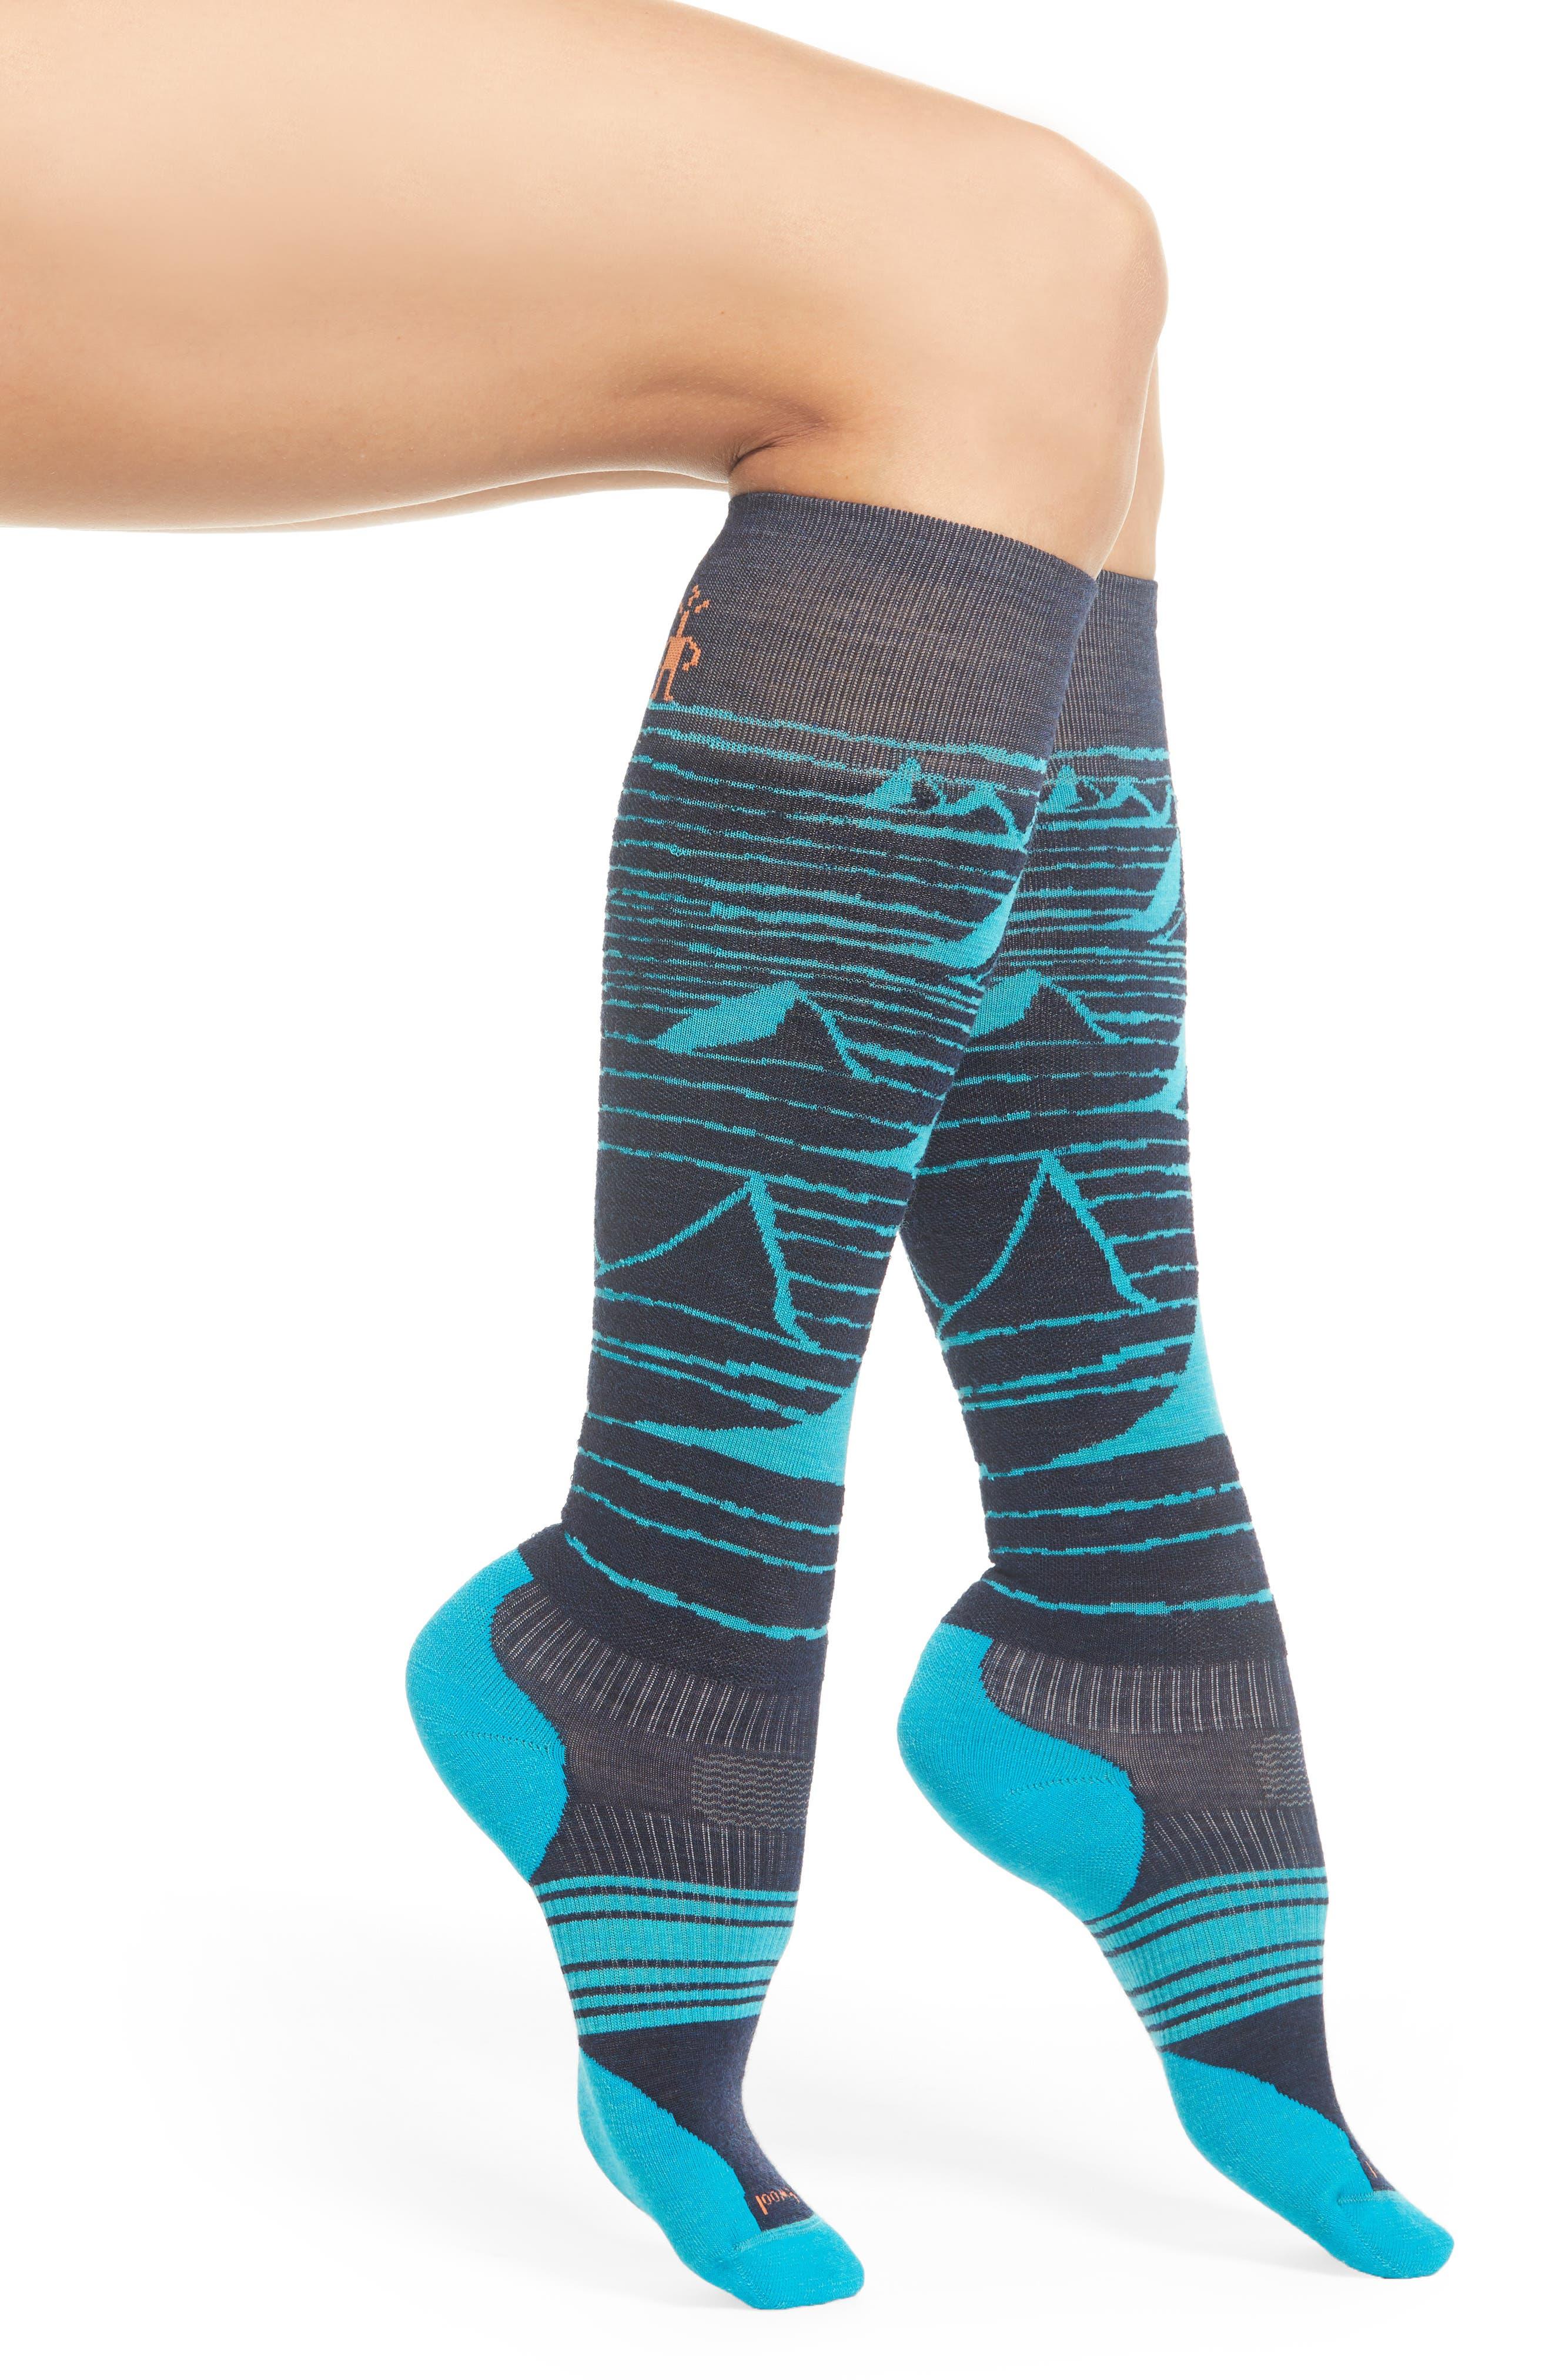 PhD<sup>®</sup> Slopestyle Light Elite Ski Socks,                             Main thumbnail 1, color,                             DEEP NAVY